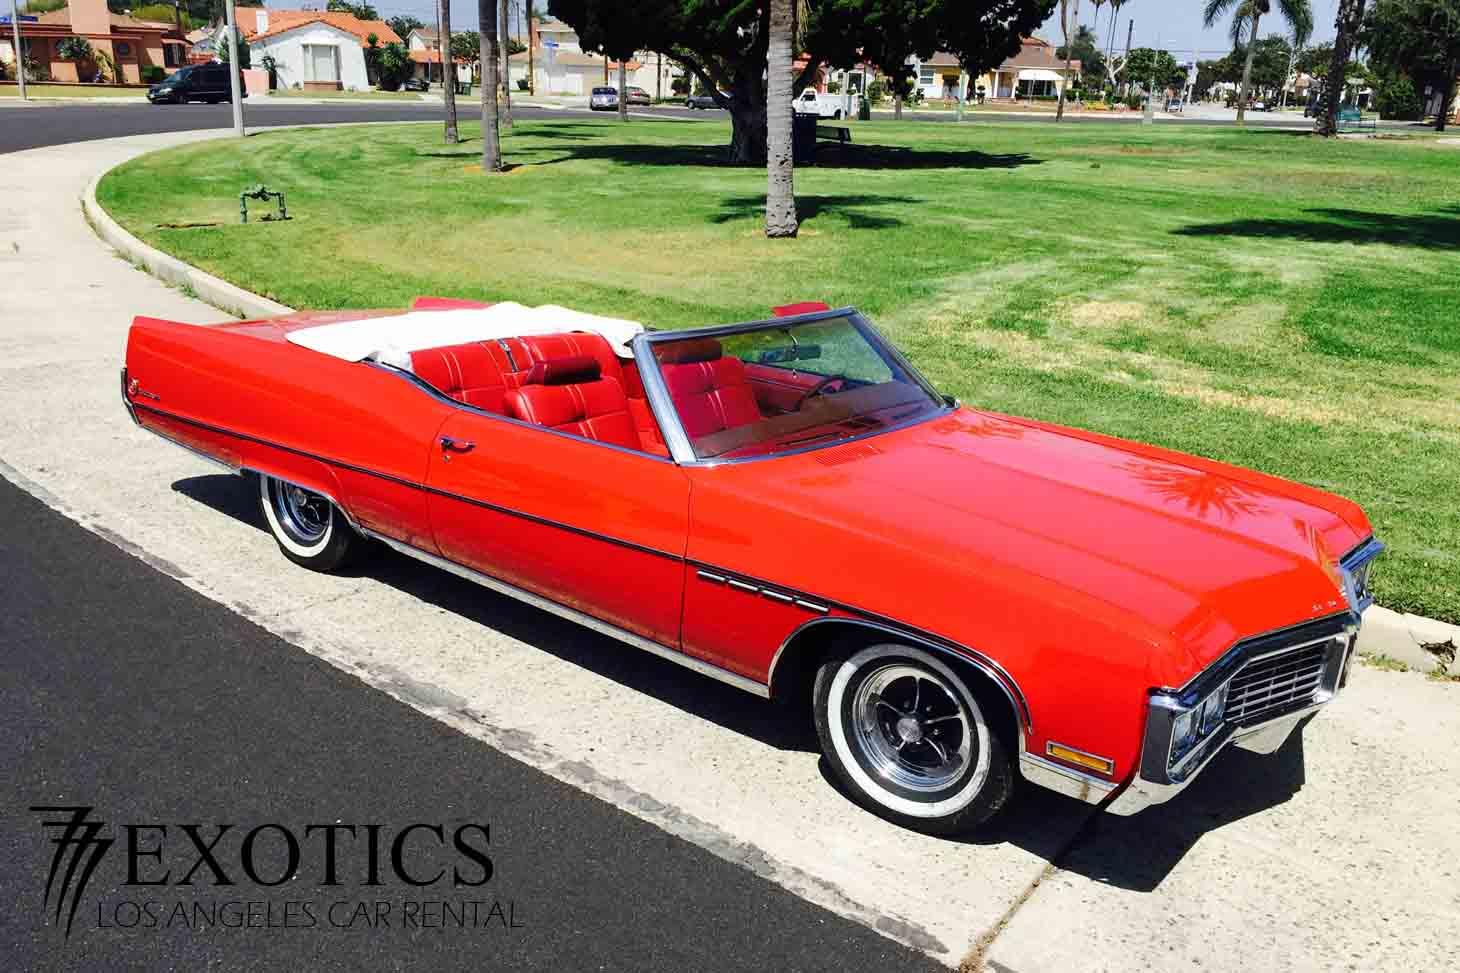 Exotic Car Rental Las Vegas >> 1970 Buick Electra Rental Los Angeles and Las Vegas